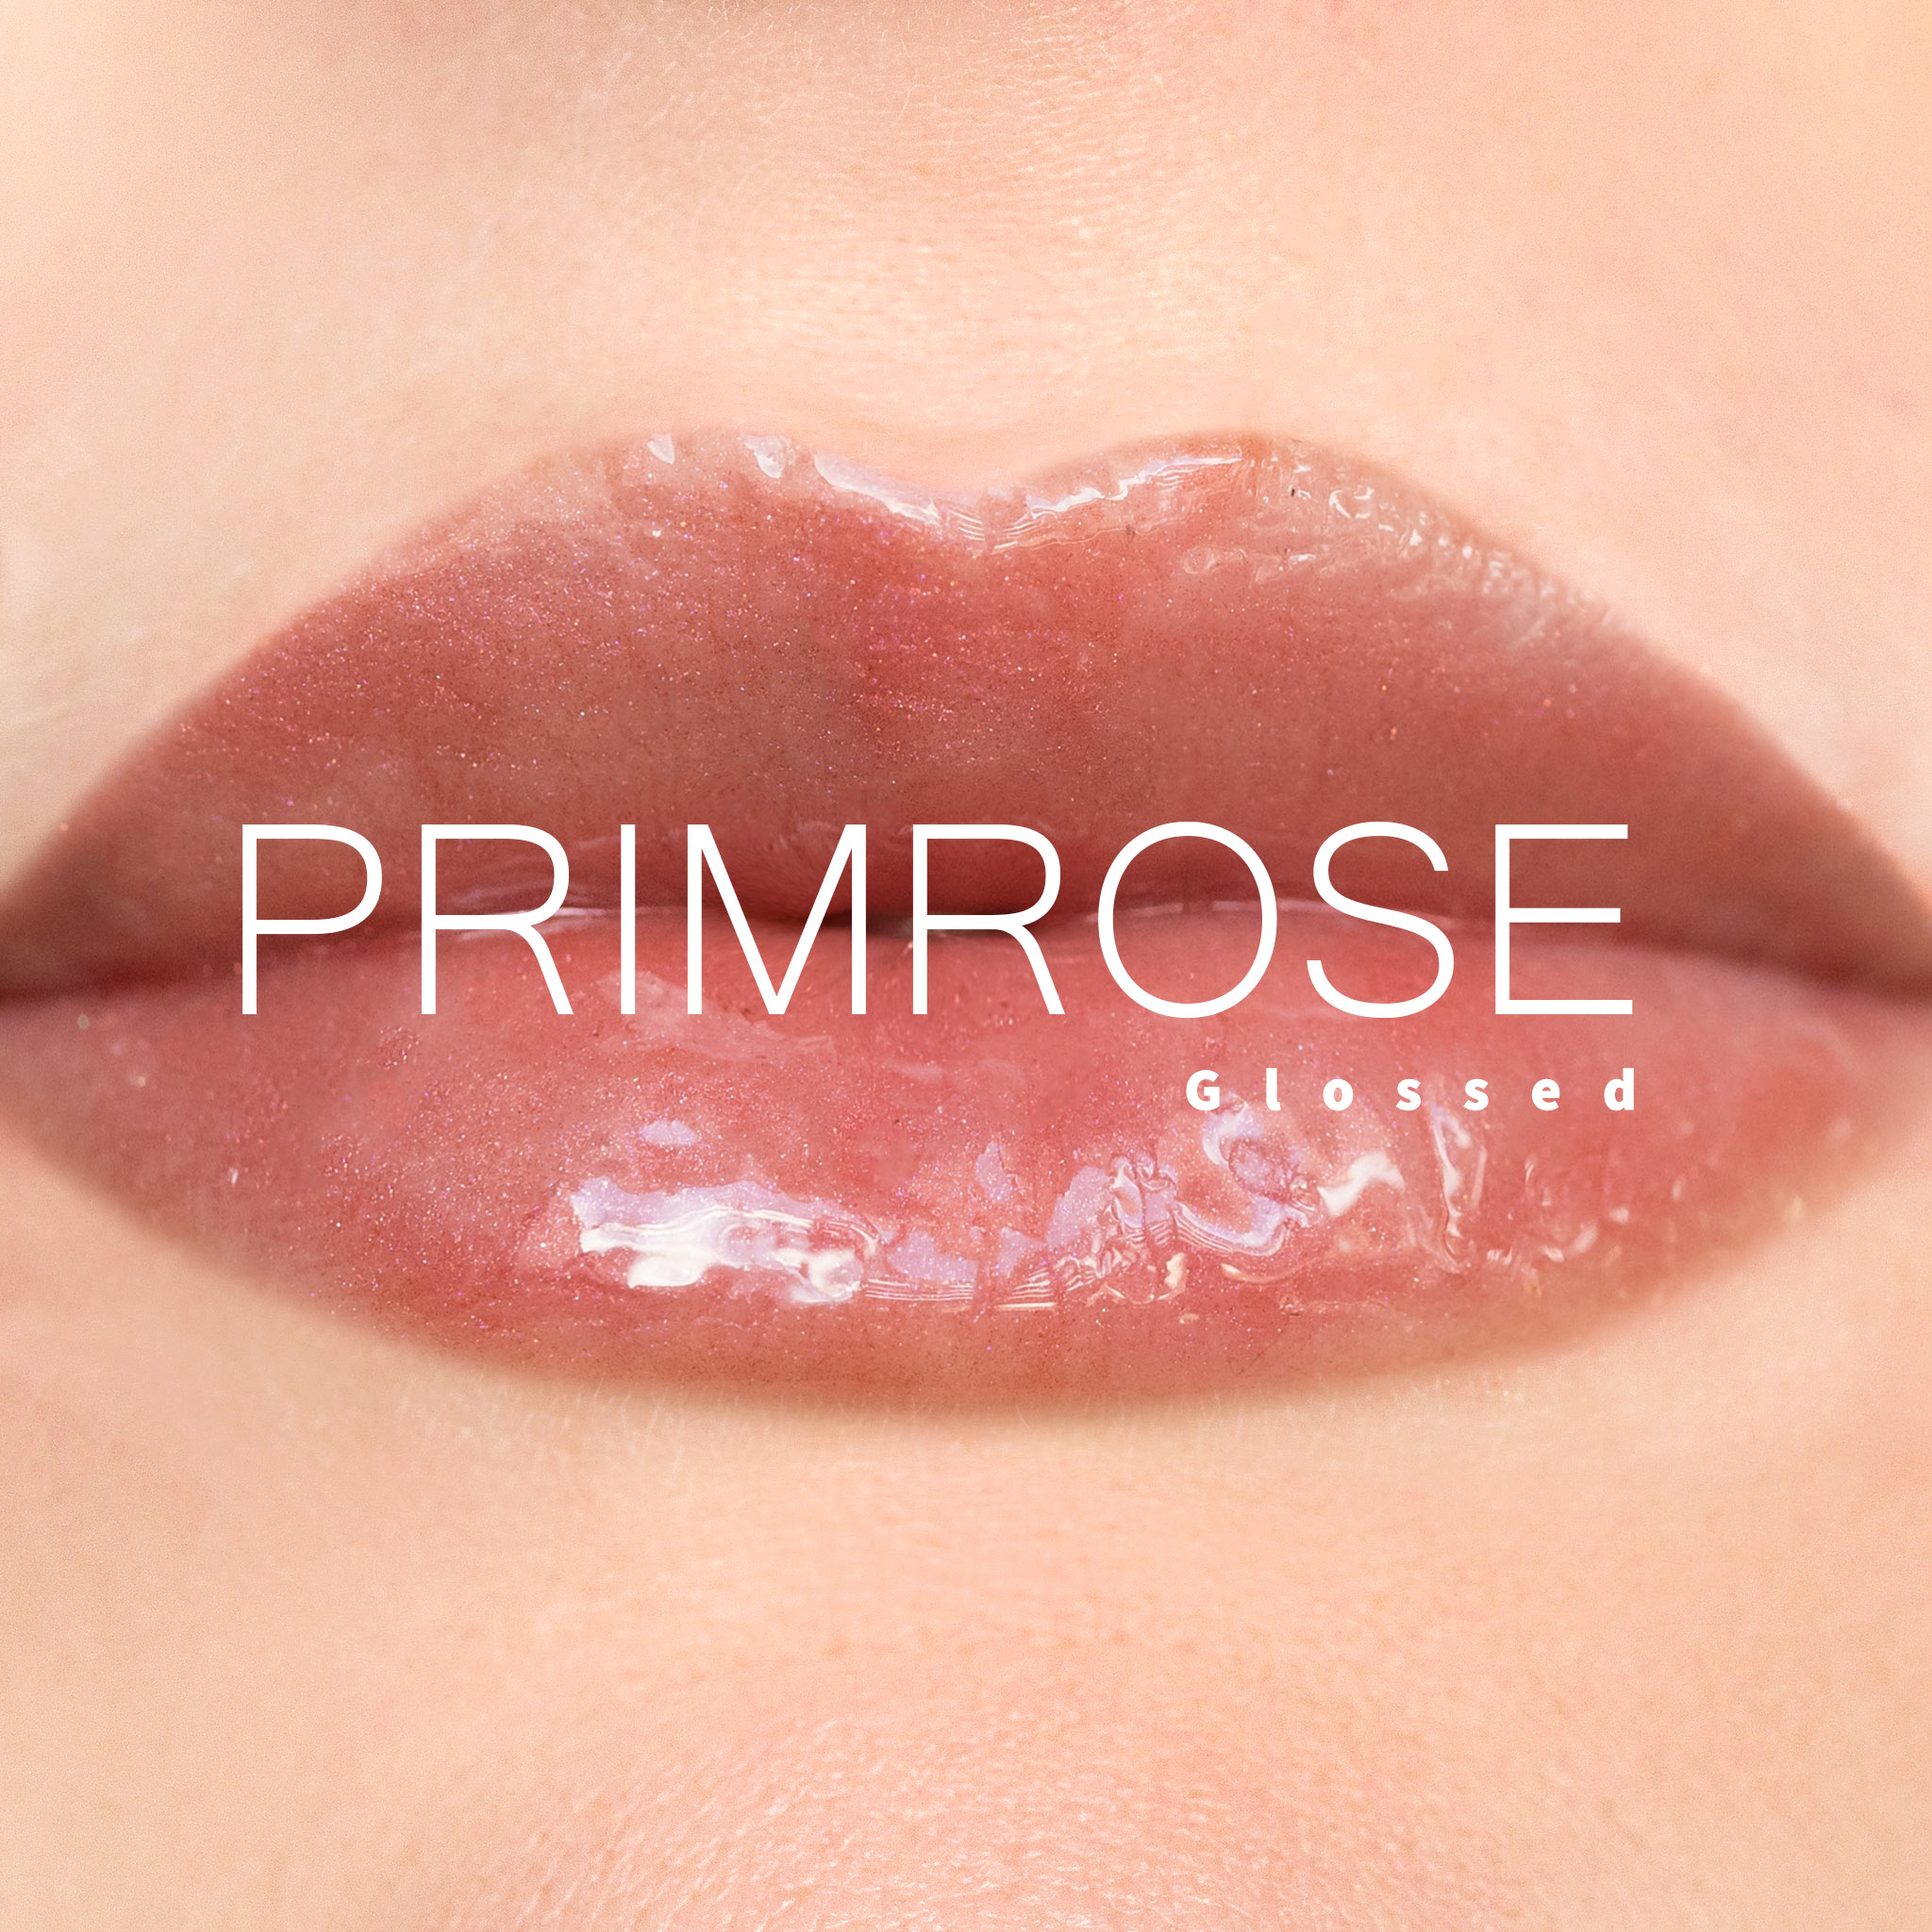 Primrose7.jpg